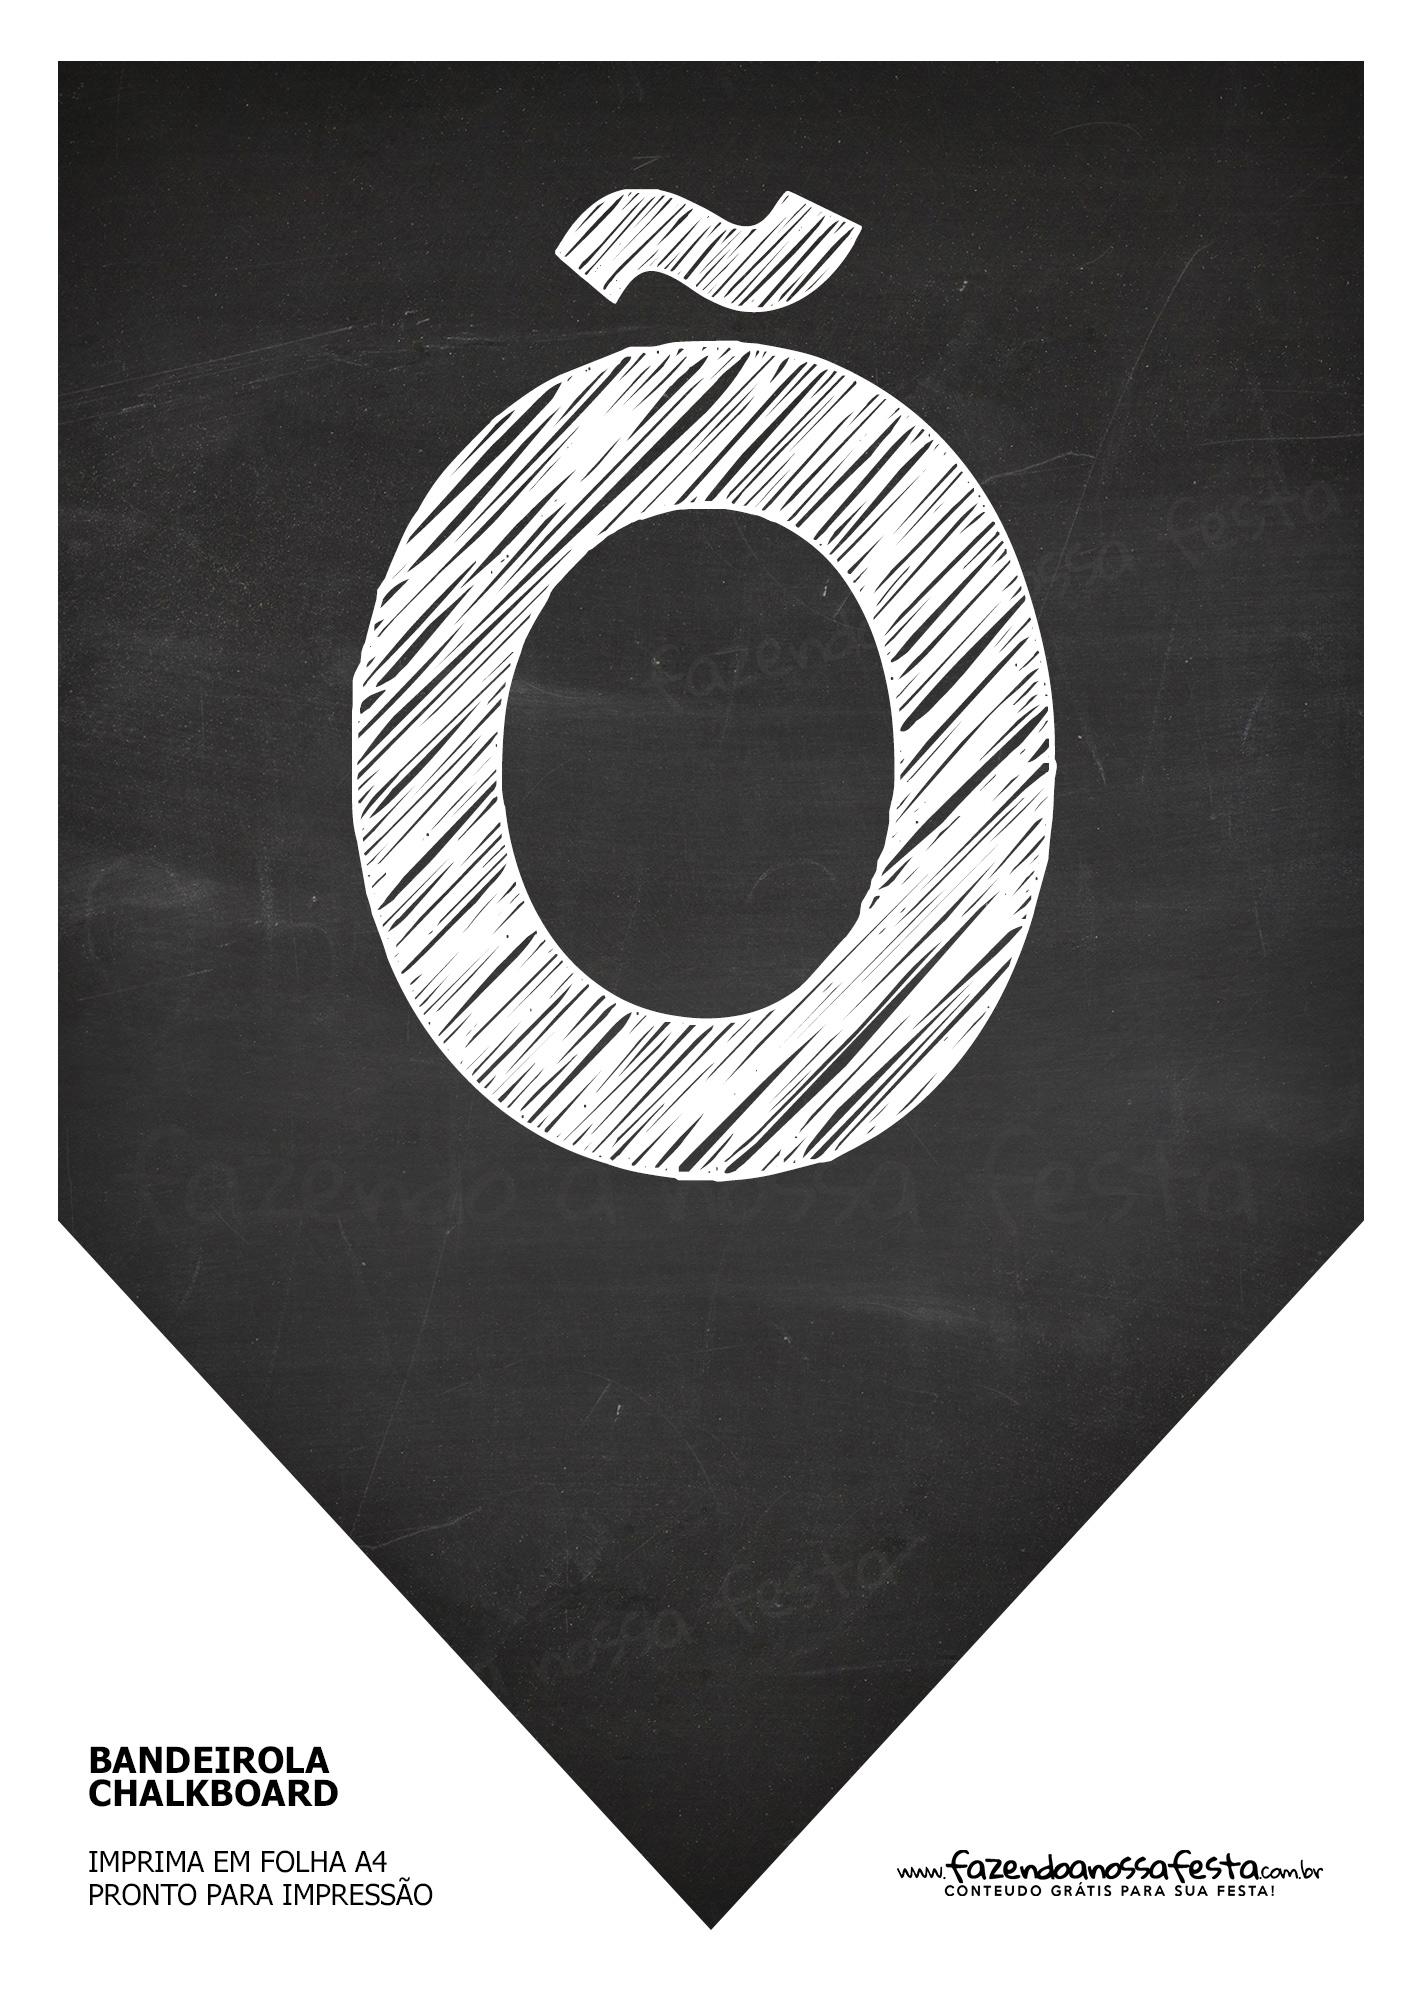 Bandeirinha Chalkboard õ